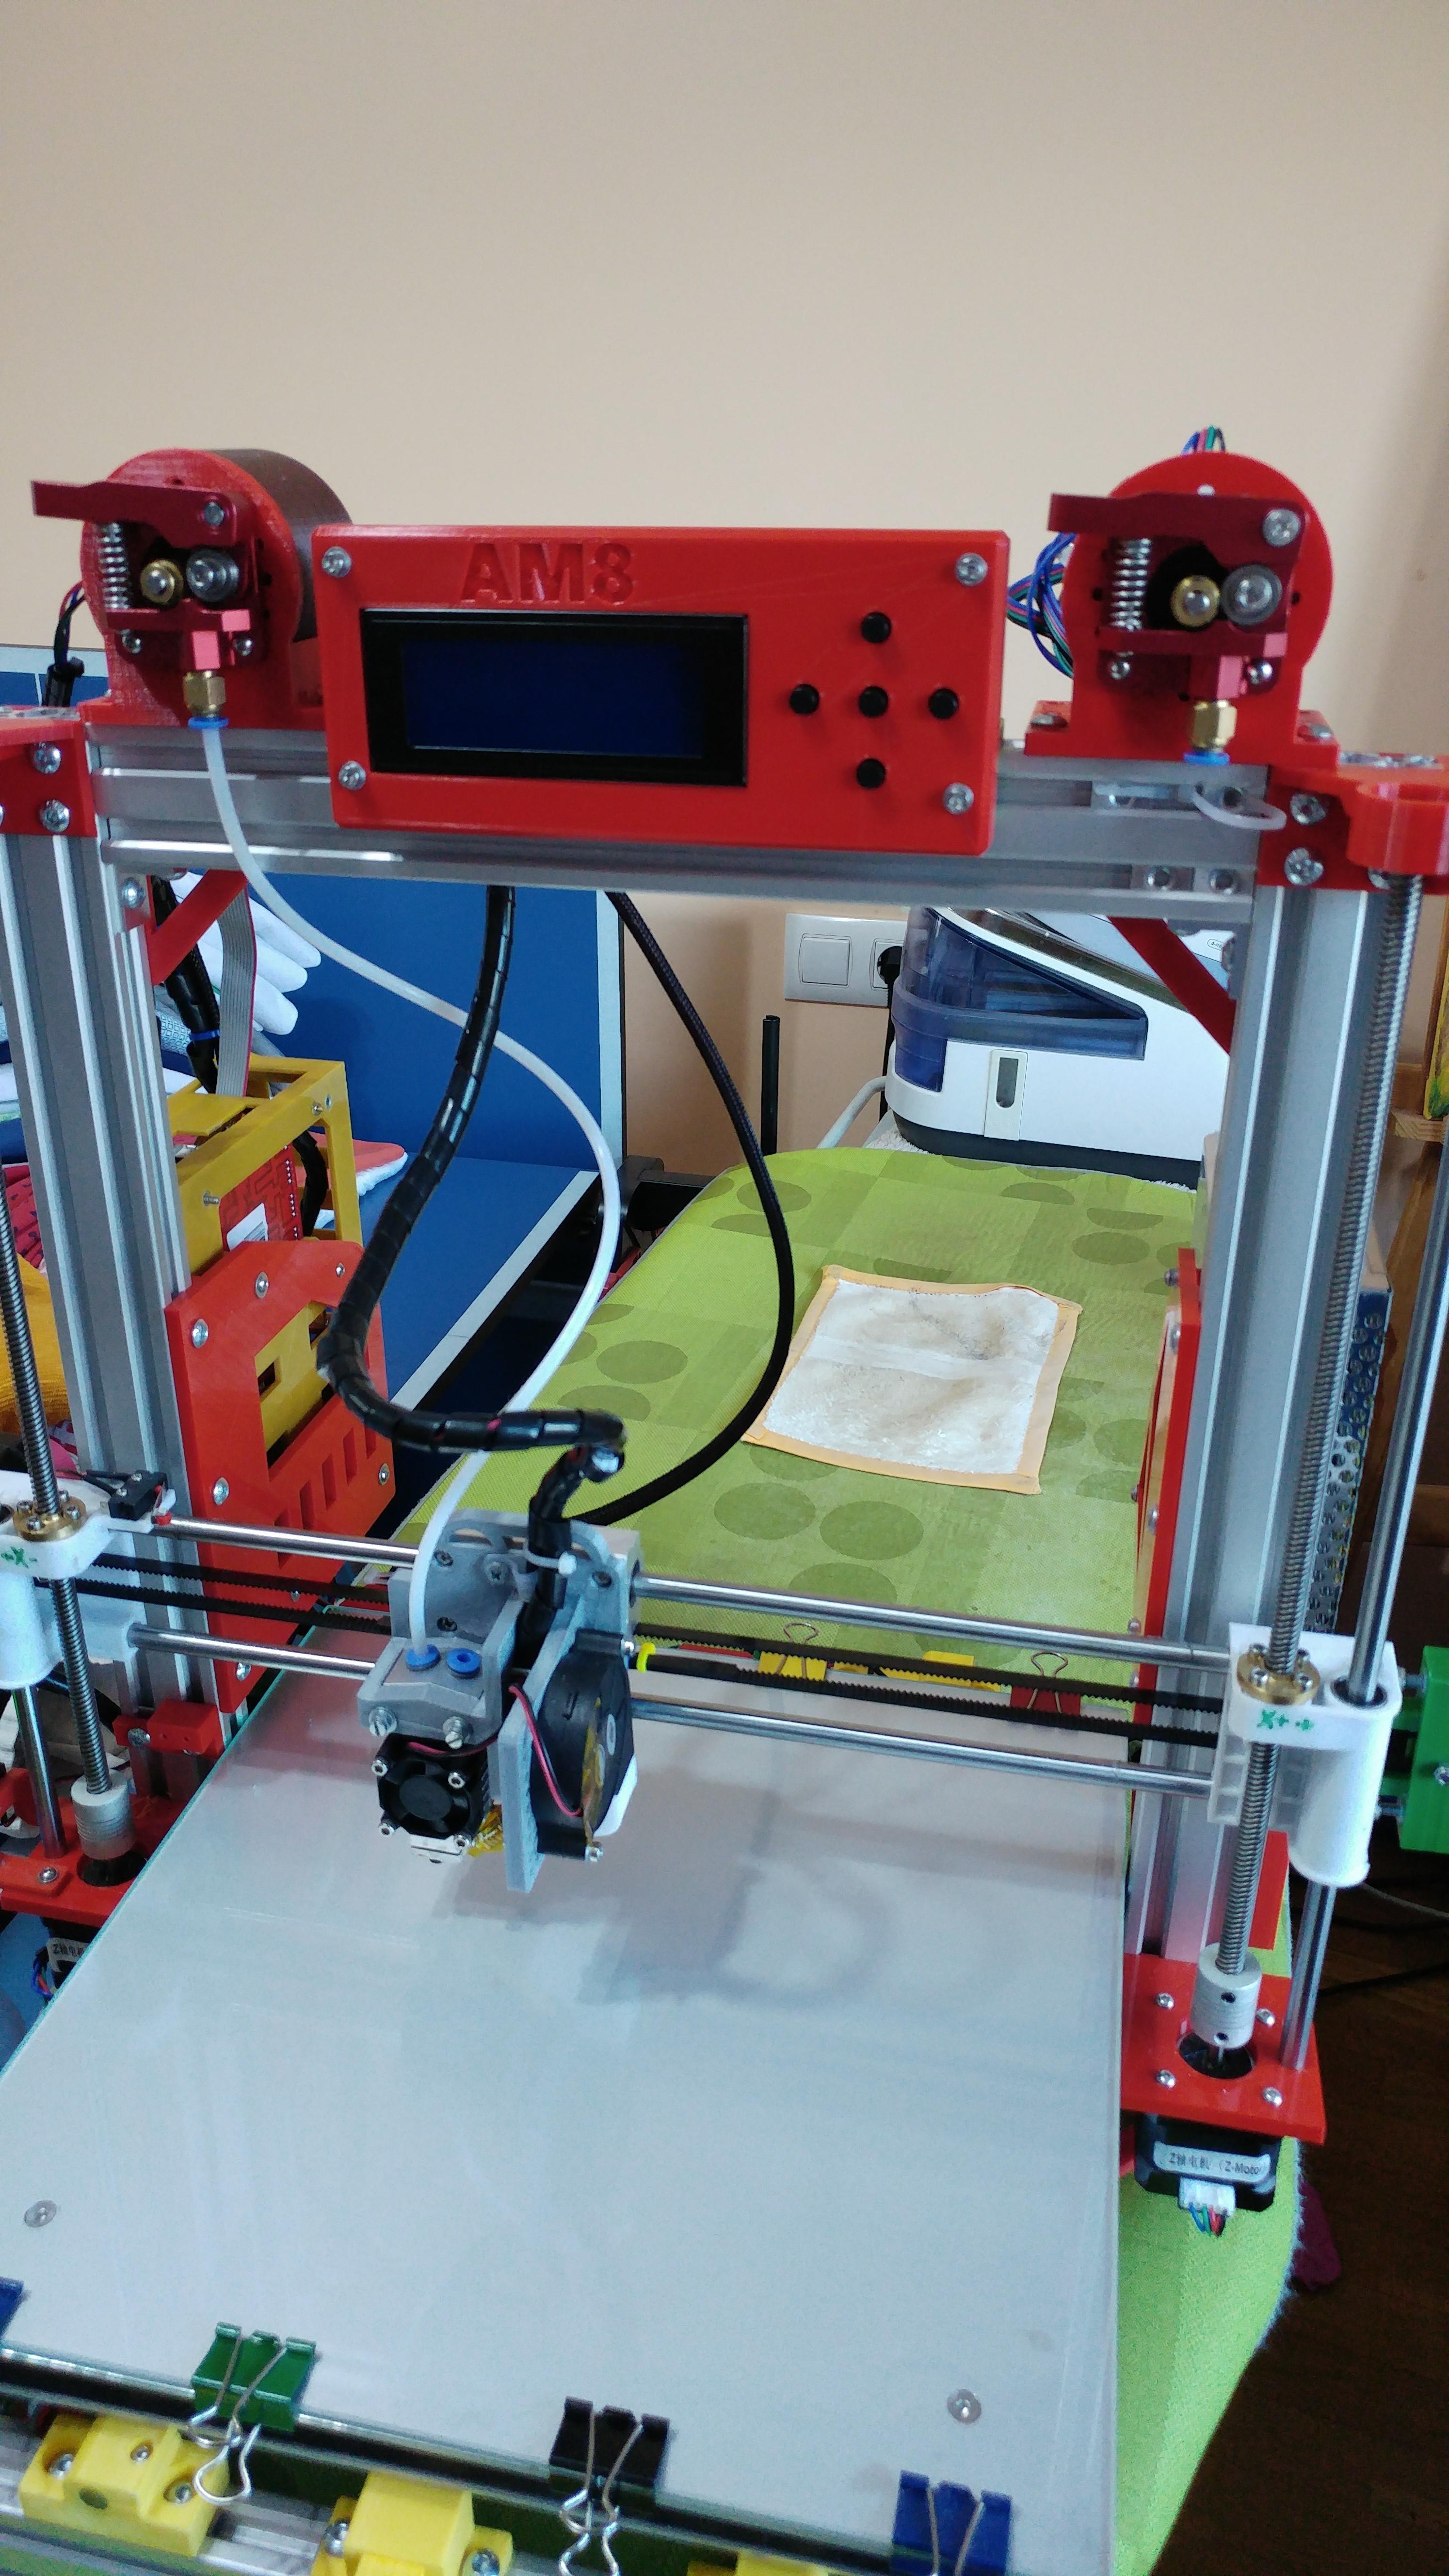 20190624_205110.jpg Télécharger fichier STL gratuit SOPORTE VARILLAS, TENSOR CORREA, ANCLAJE CORREA EJE Y, SOPORTE LCD ANET AM8 EN CAMA DE 300X300 • Design pour imprimante 3D, celtarra12